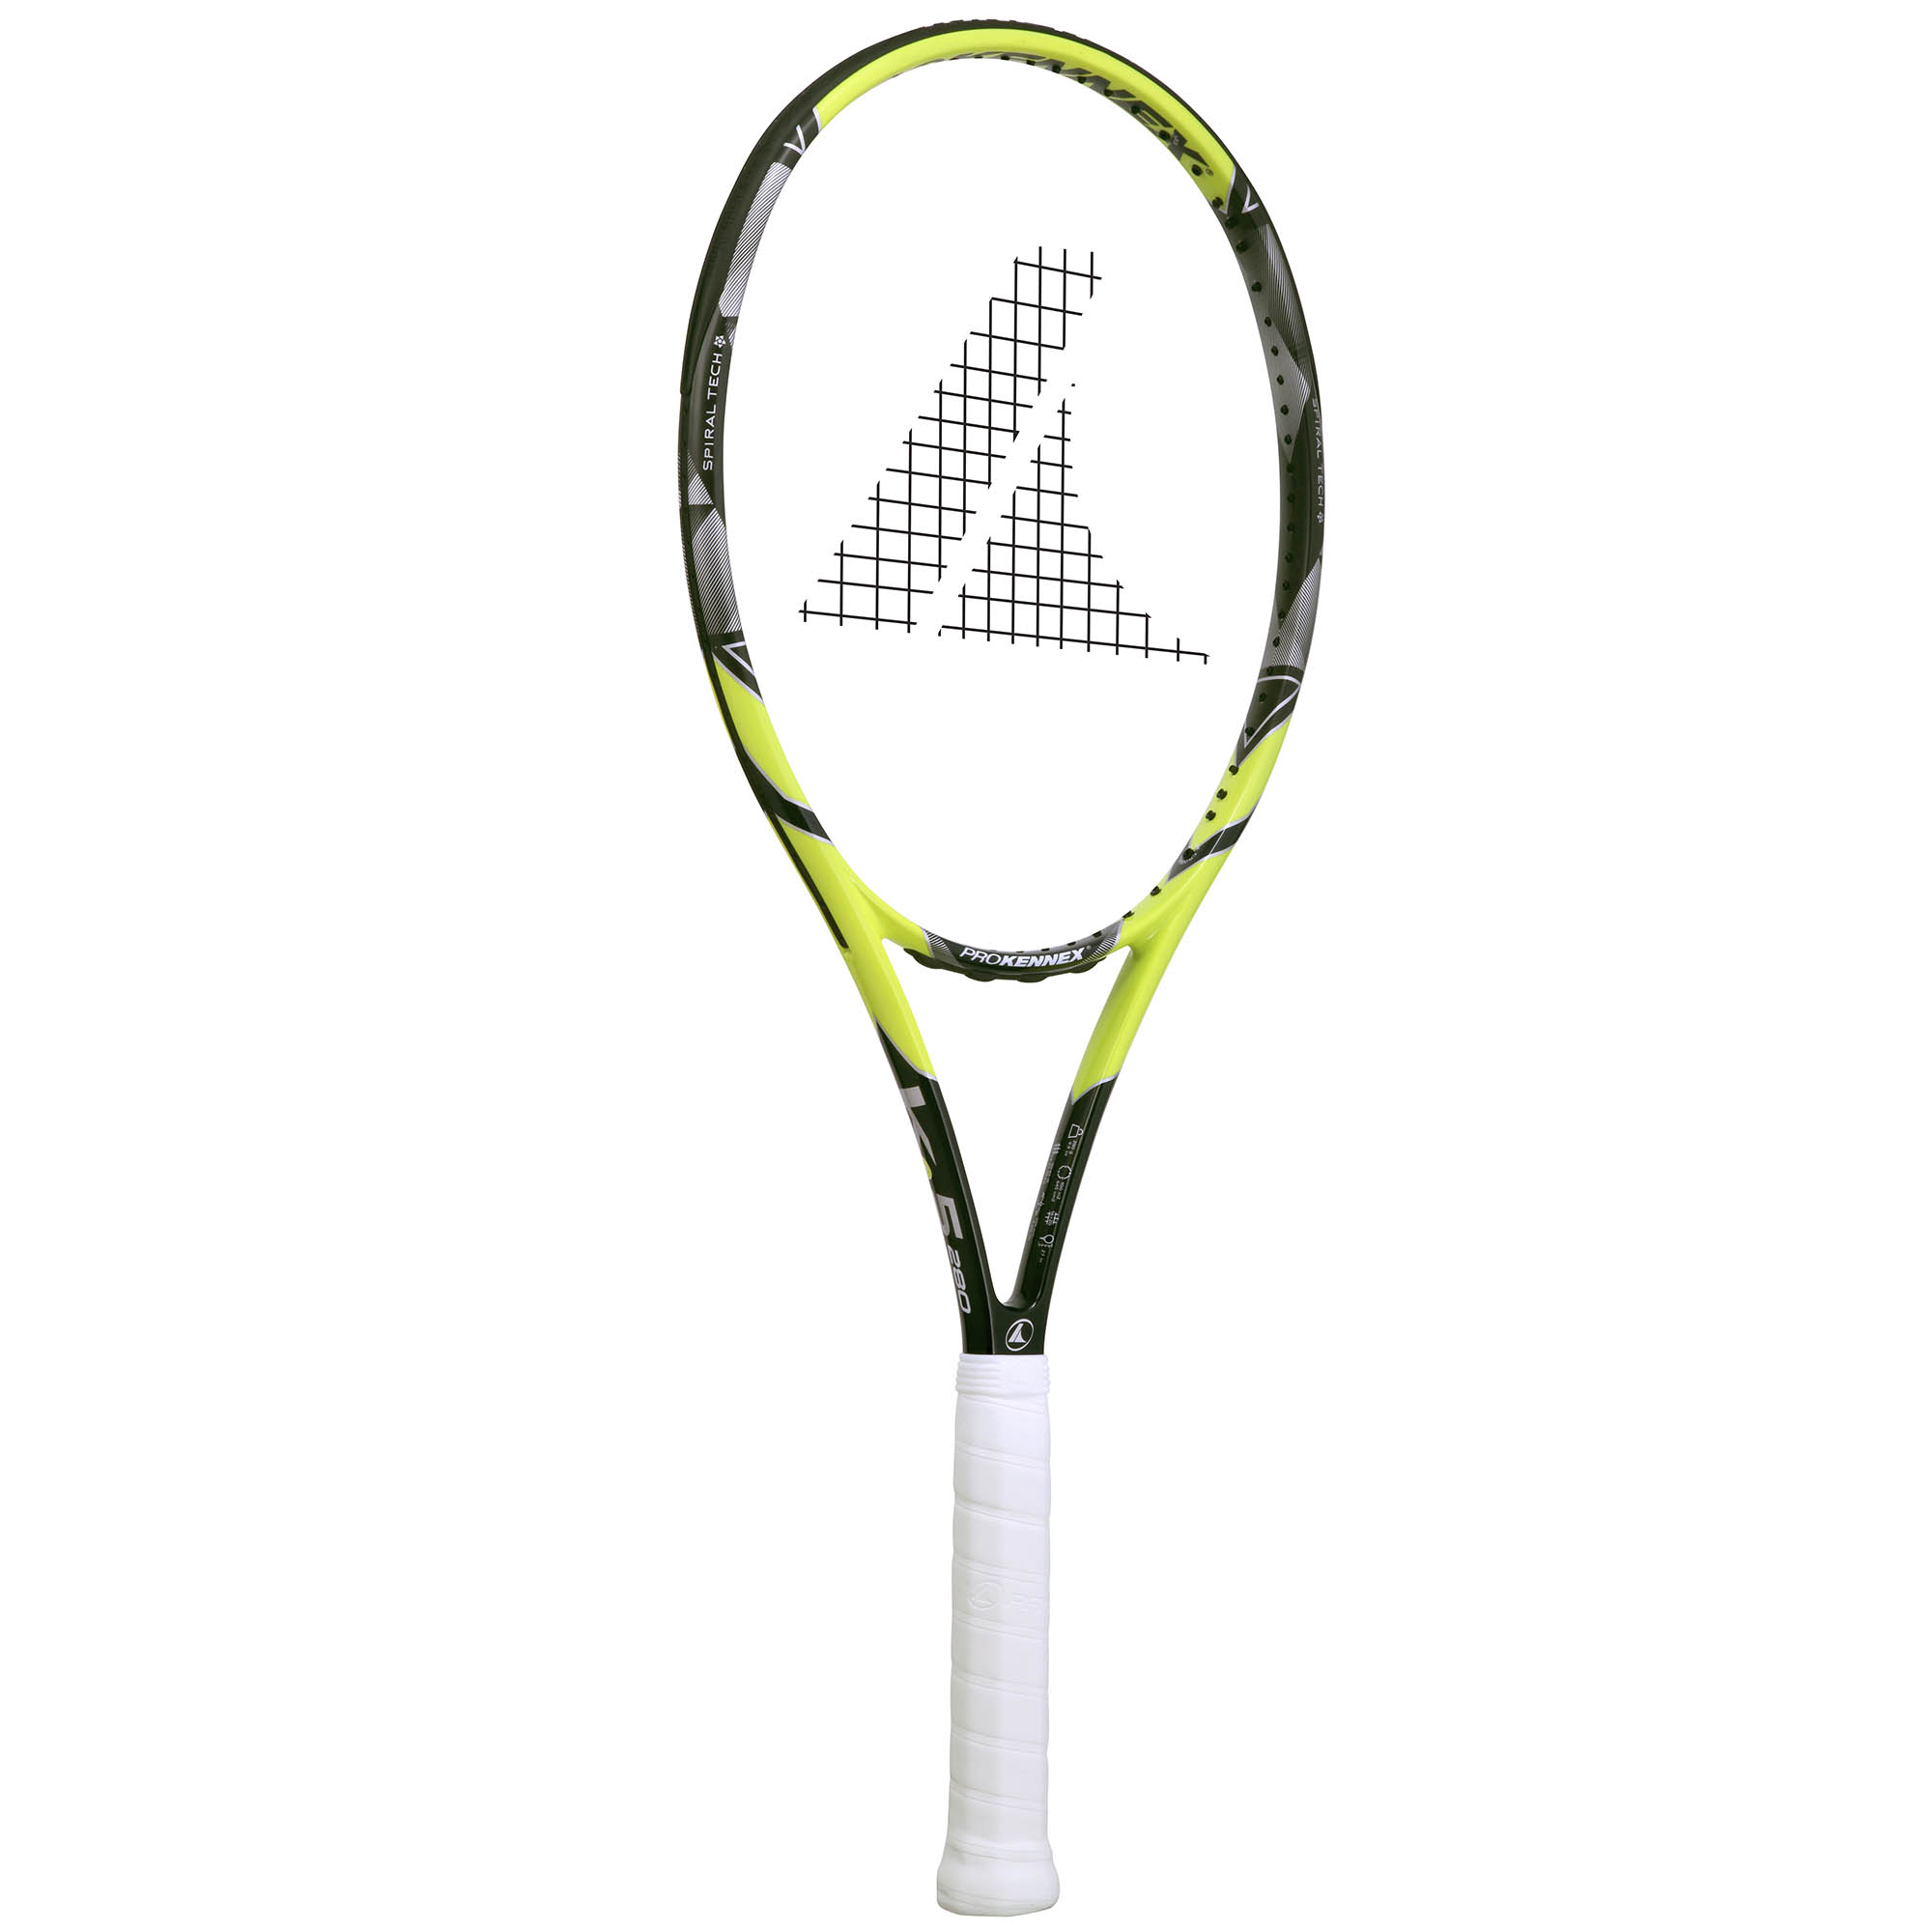 ProKennex Ki 5 280 Tennis Racket – Grip 4